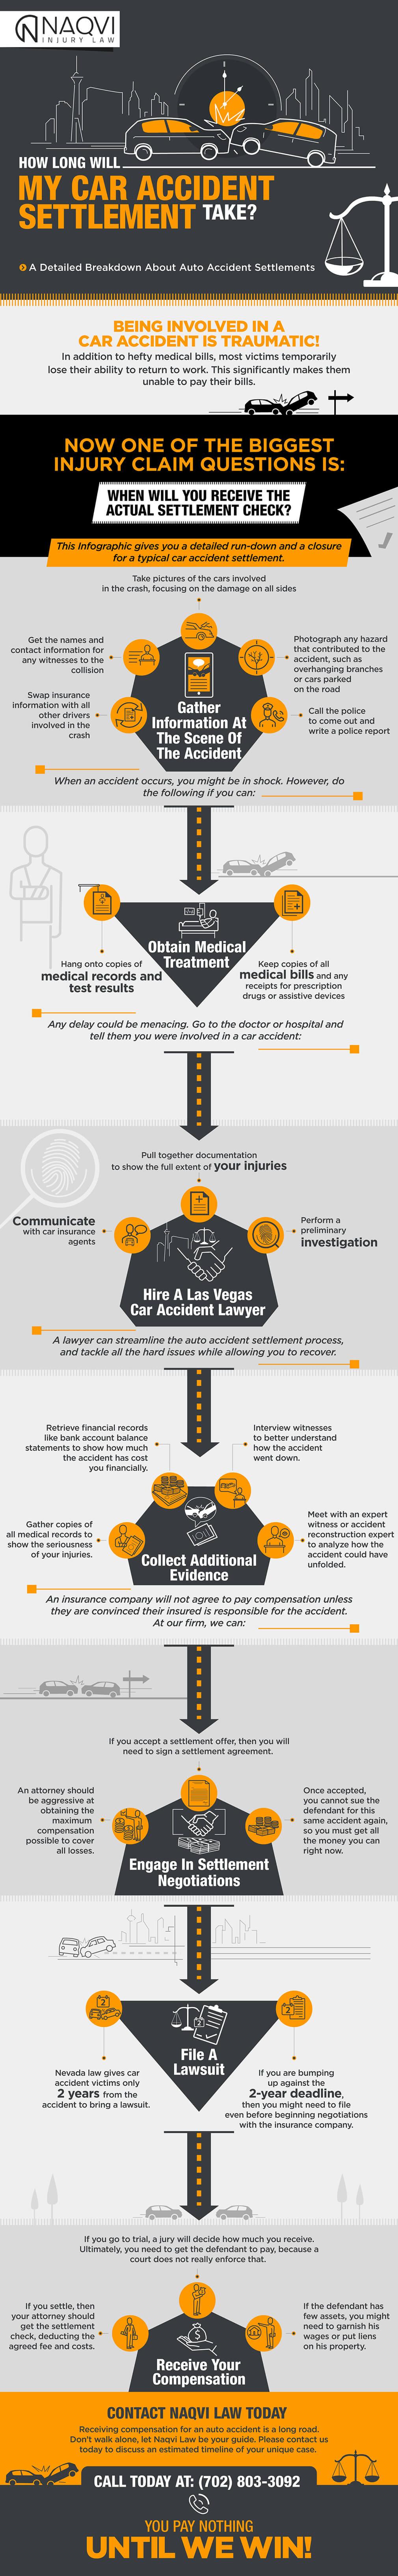 Car-Settlement-Timeline-infographic-plaza